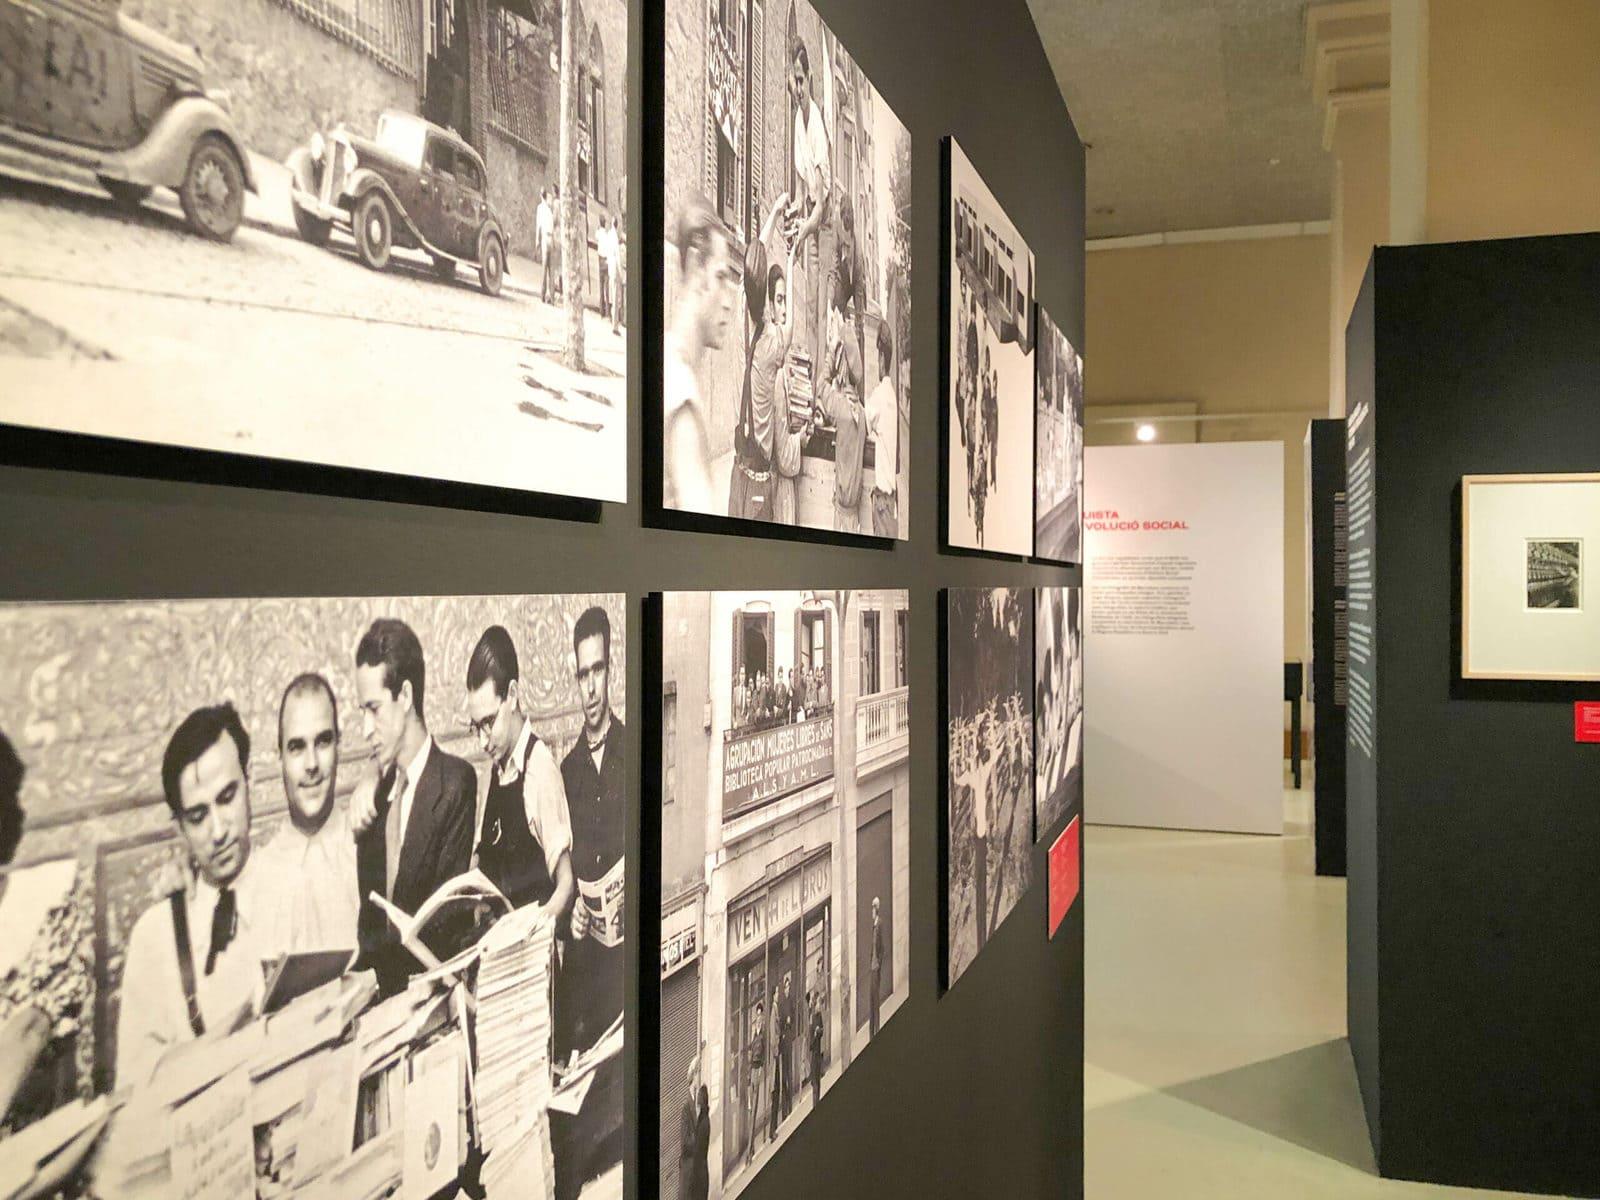 Arxiu Fotografic, Barcelona